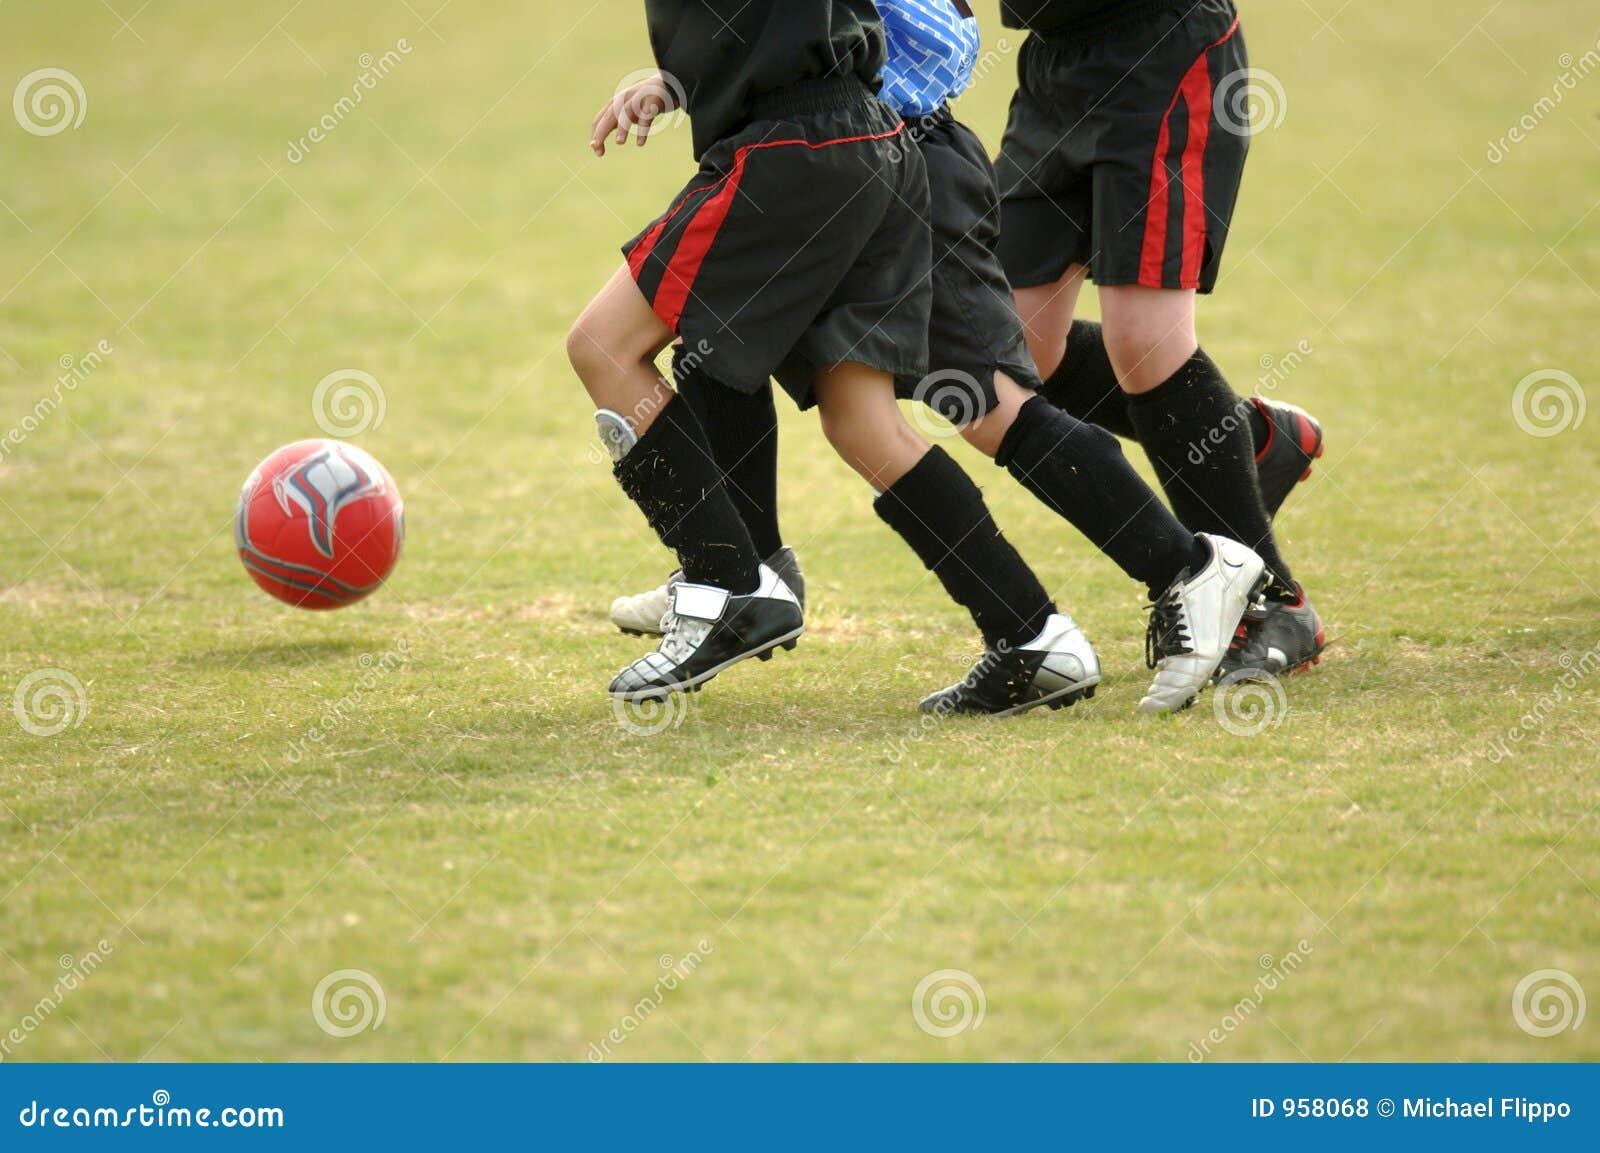 Children playing soccer - football